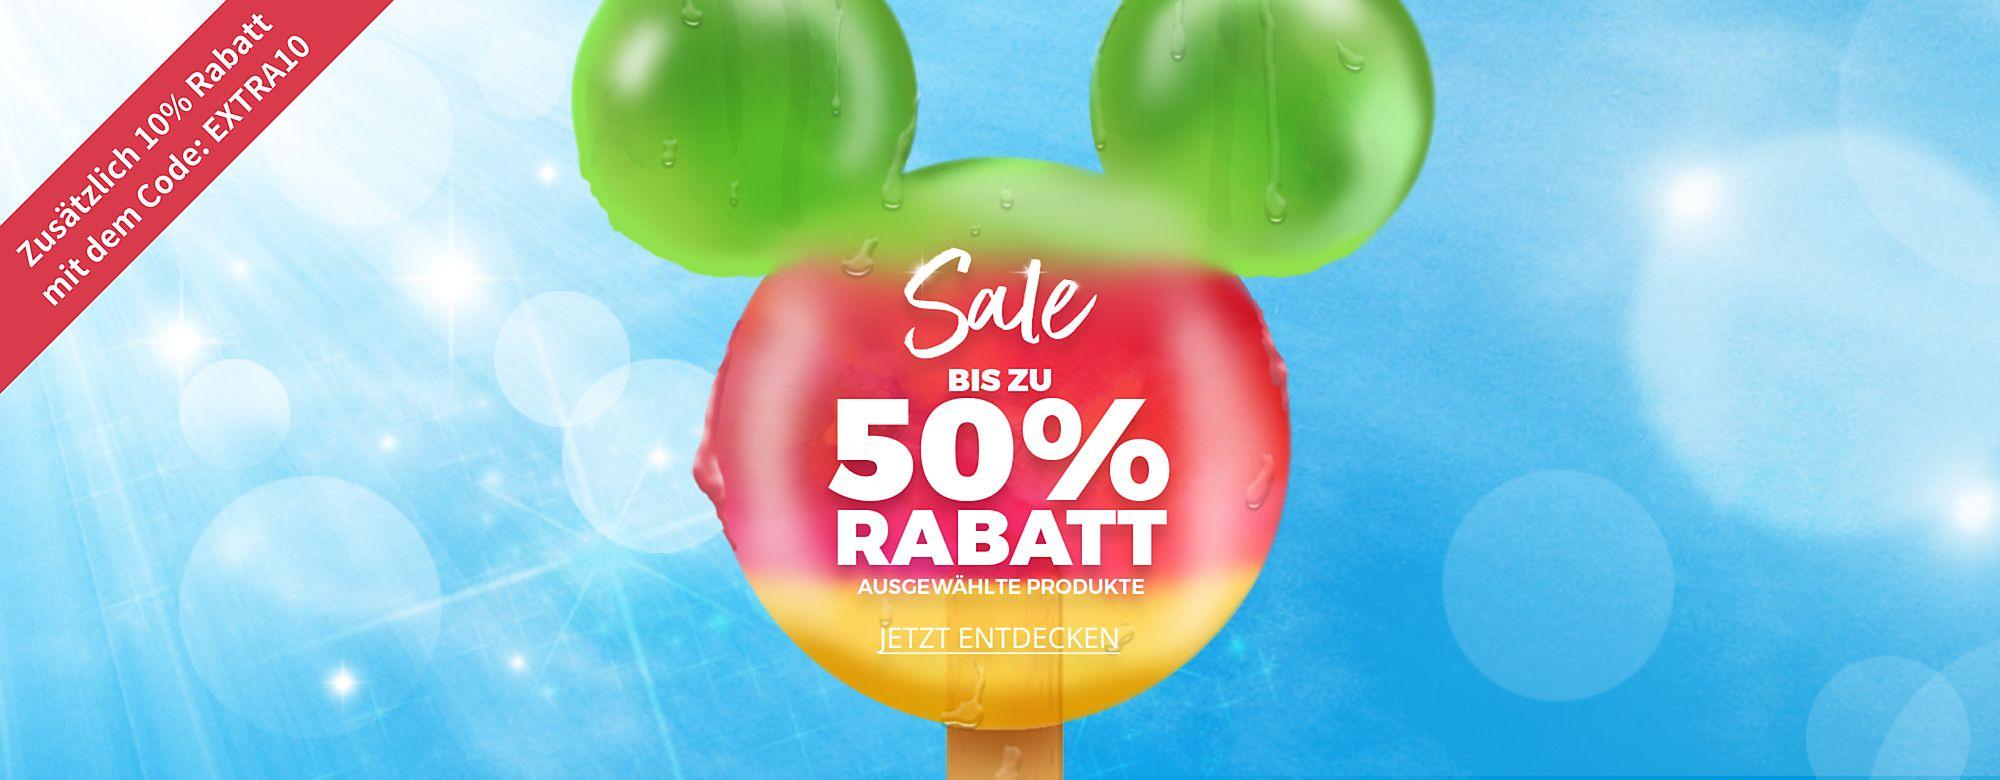 Shopdisney Dein Online Shop Fur Disney Pixar Marvel Star Wars